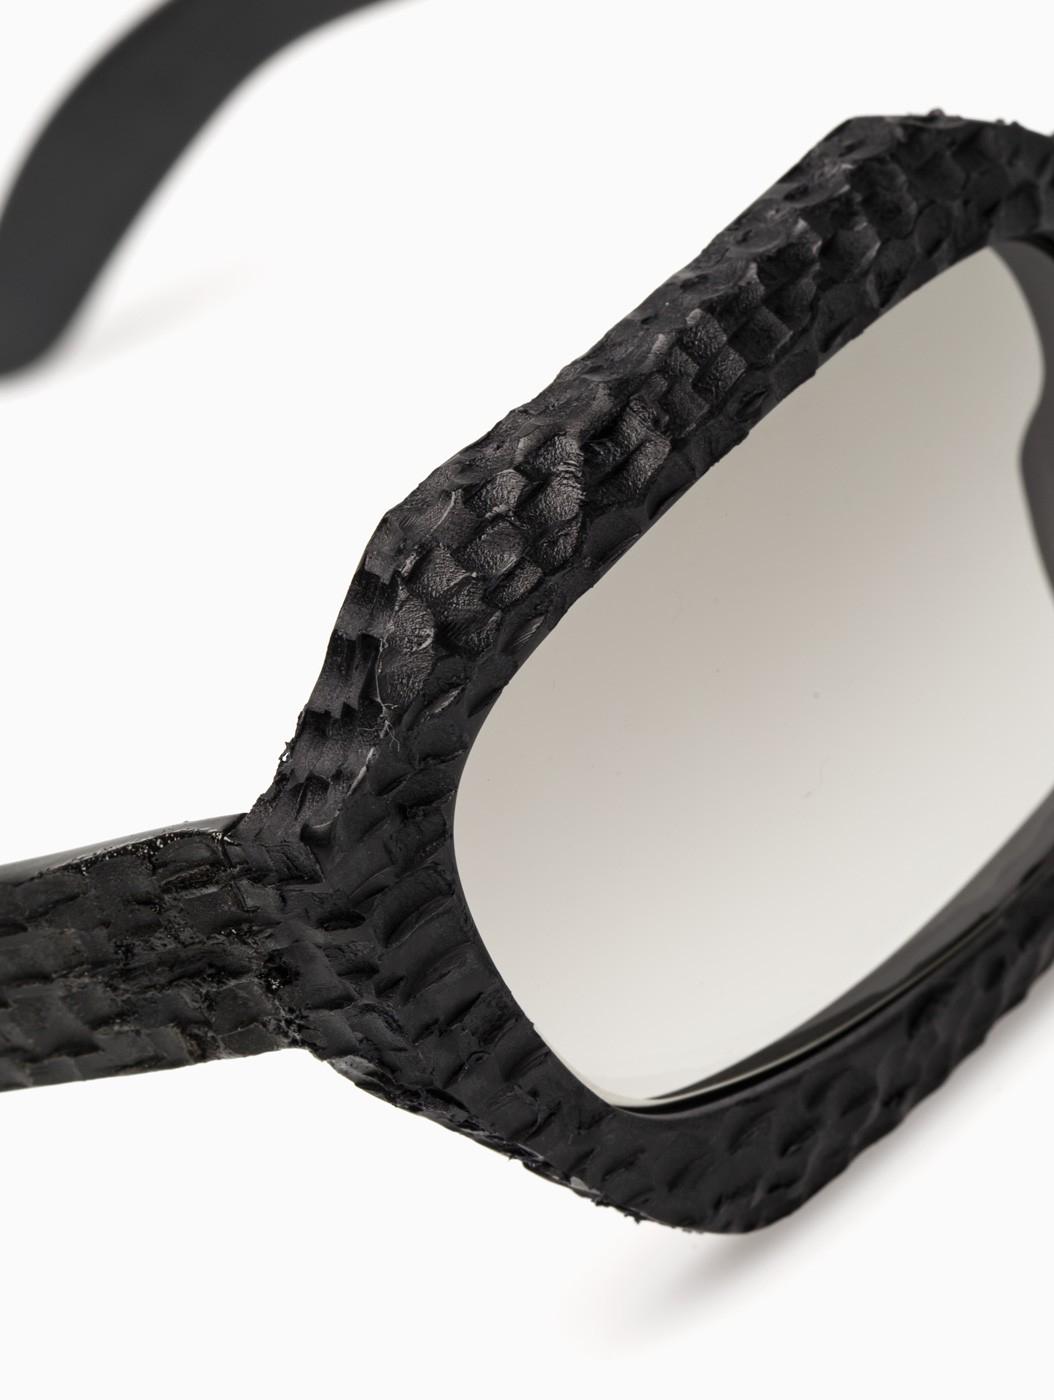 Kuboraum X2 Wt Sunglasses in Black for Men